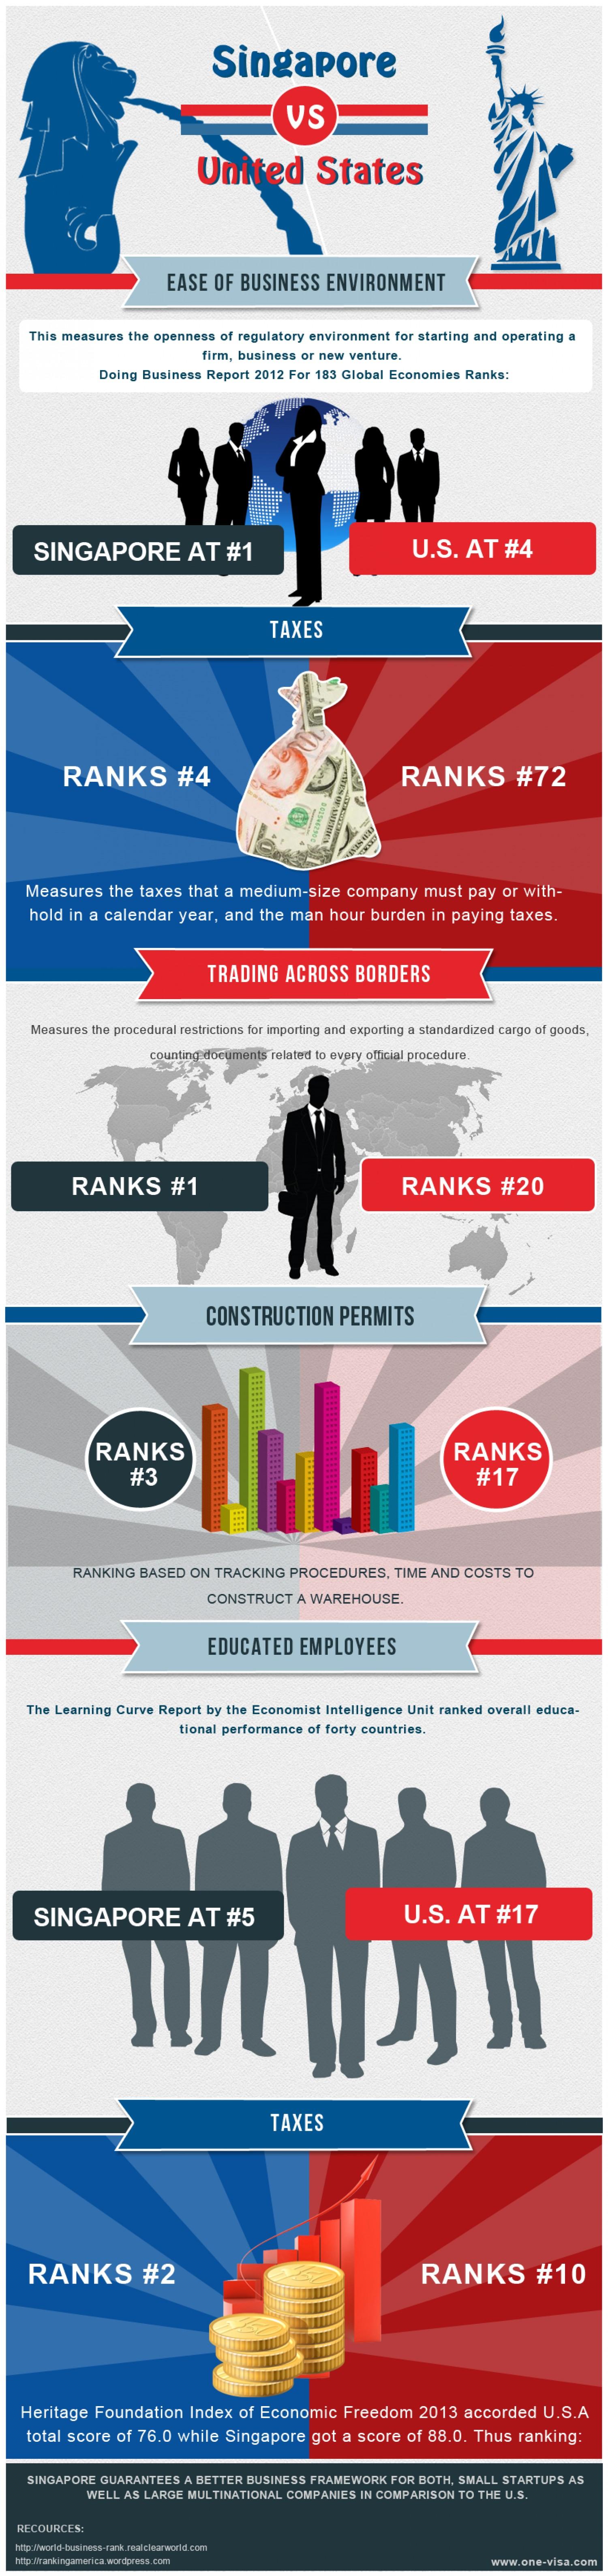 5. Singapore vs. United States